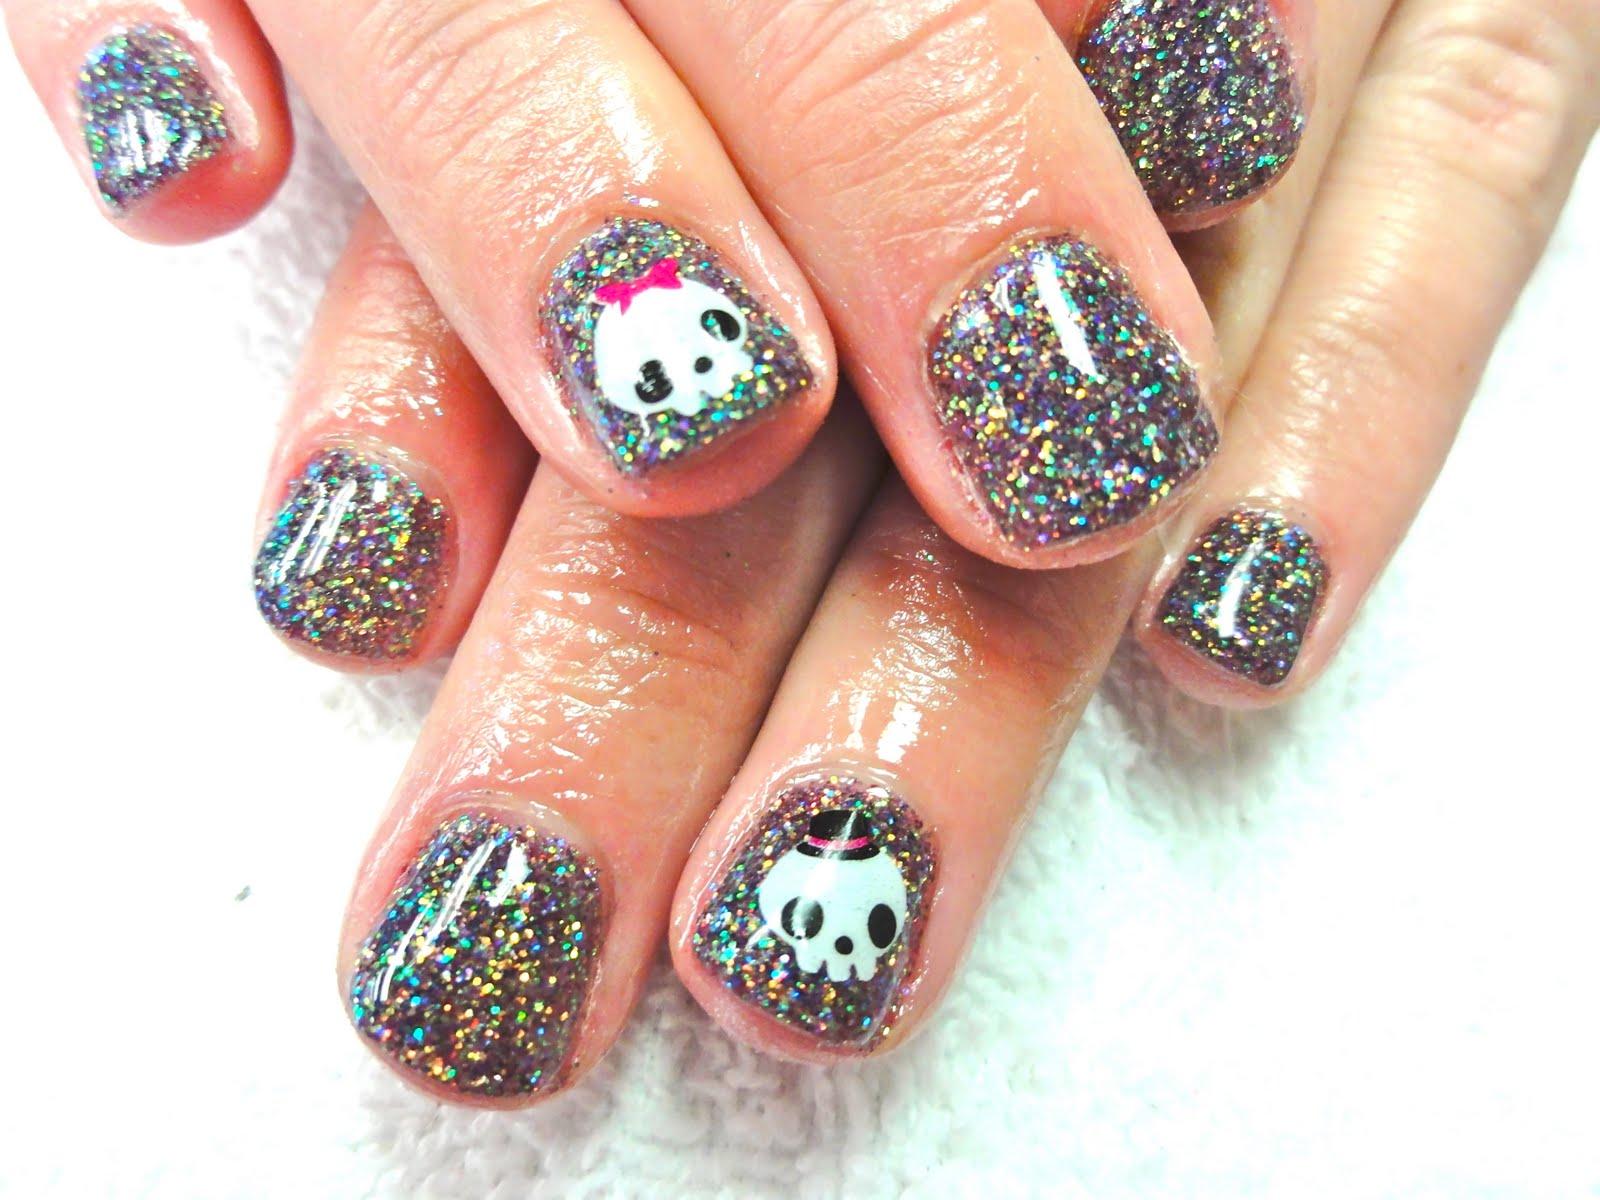 Glitter Shellac Skelaton nails. Super cute huh?